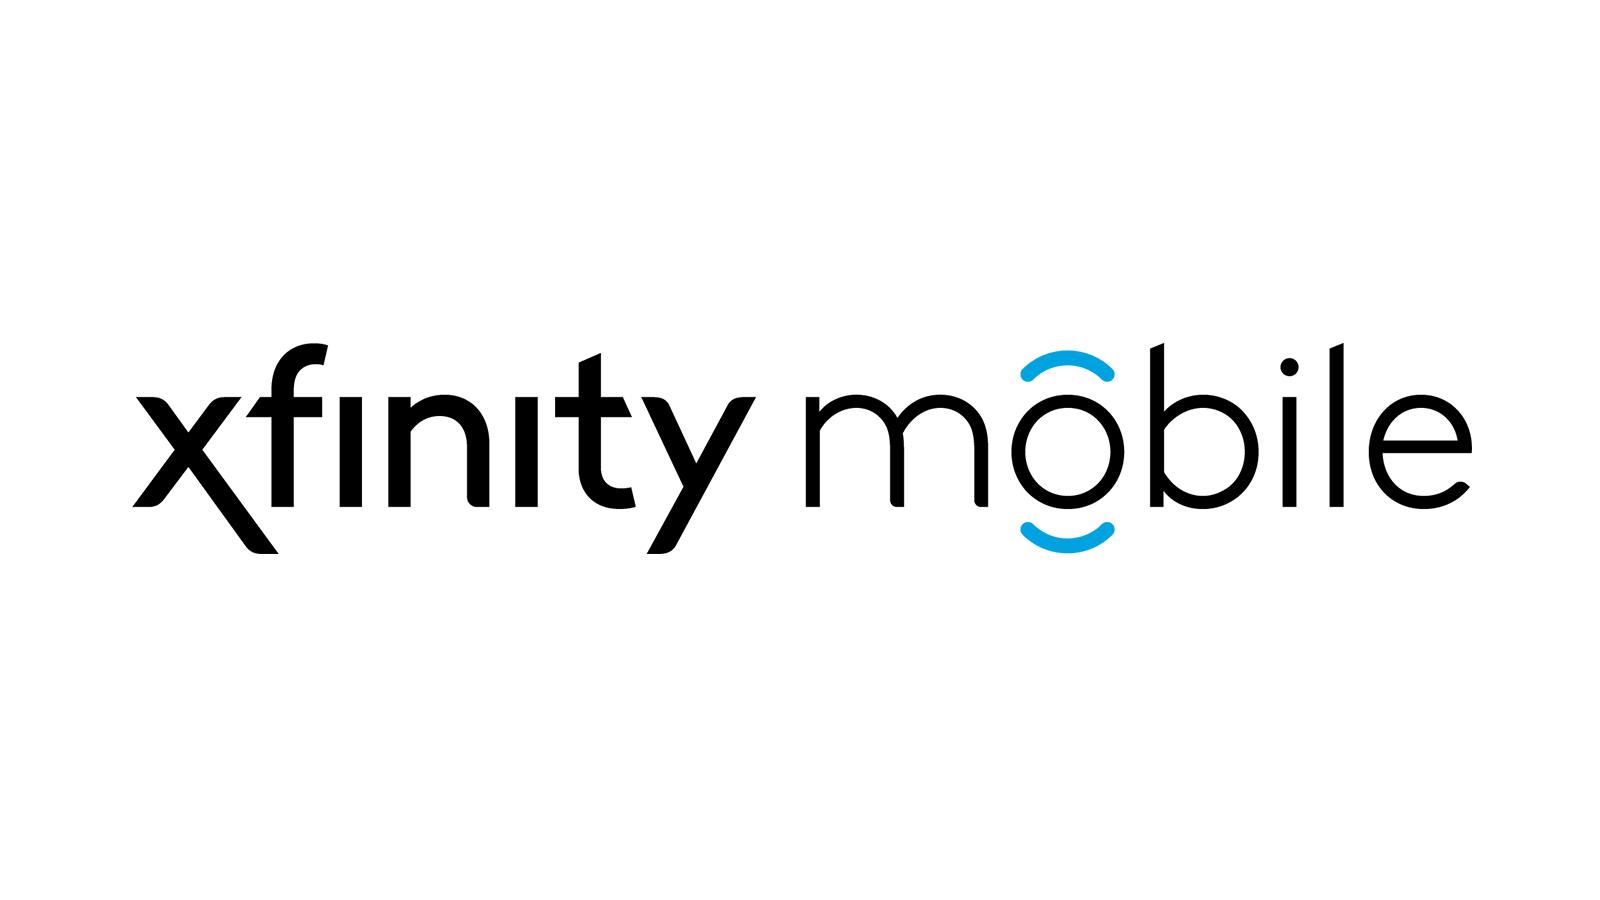 New Xfinity Mobile Plan - savings on new 3 GB and 10 GB options